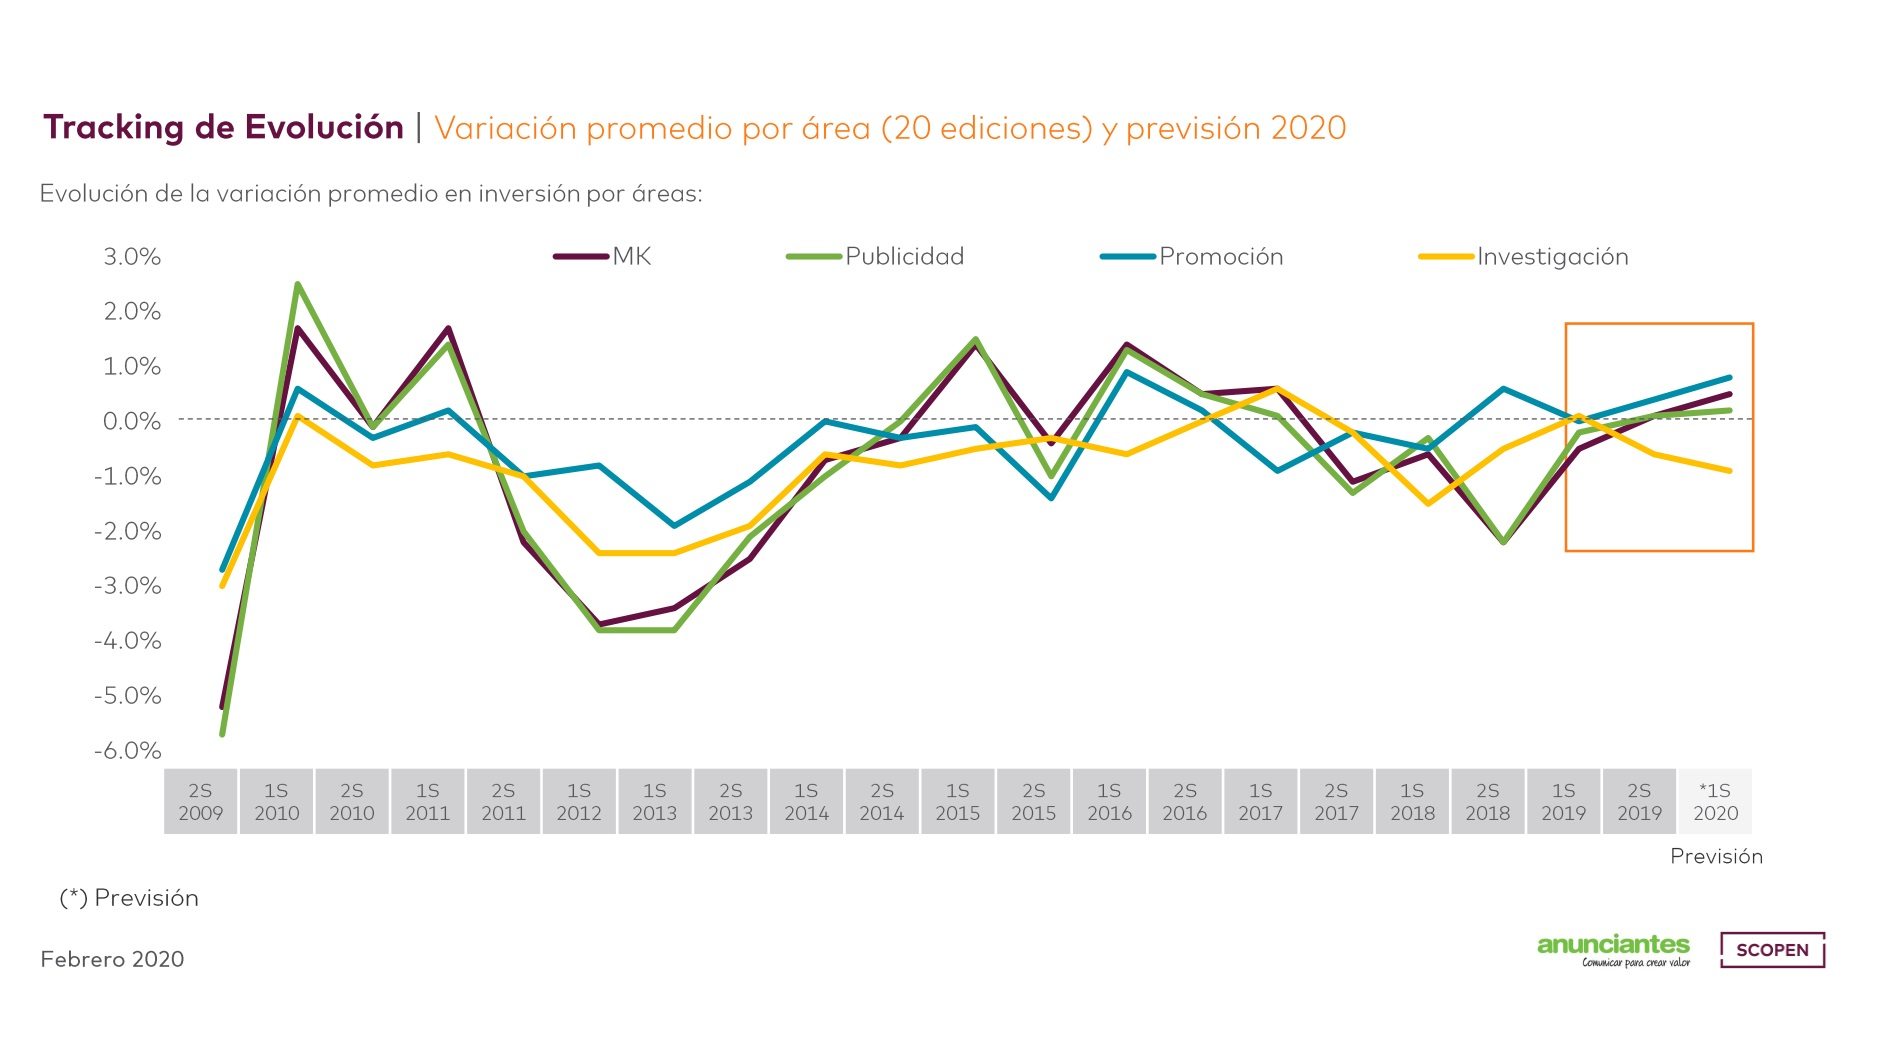 https://www.programapublicidad.com/wp-content/uploads/2020/02/tracking-barómetro-TREND-SCORE-tendencias-inversión-marketing-publicidad-programapublicidad.jpg